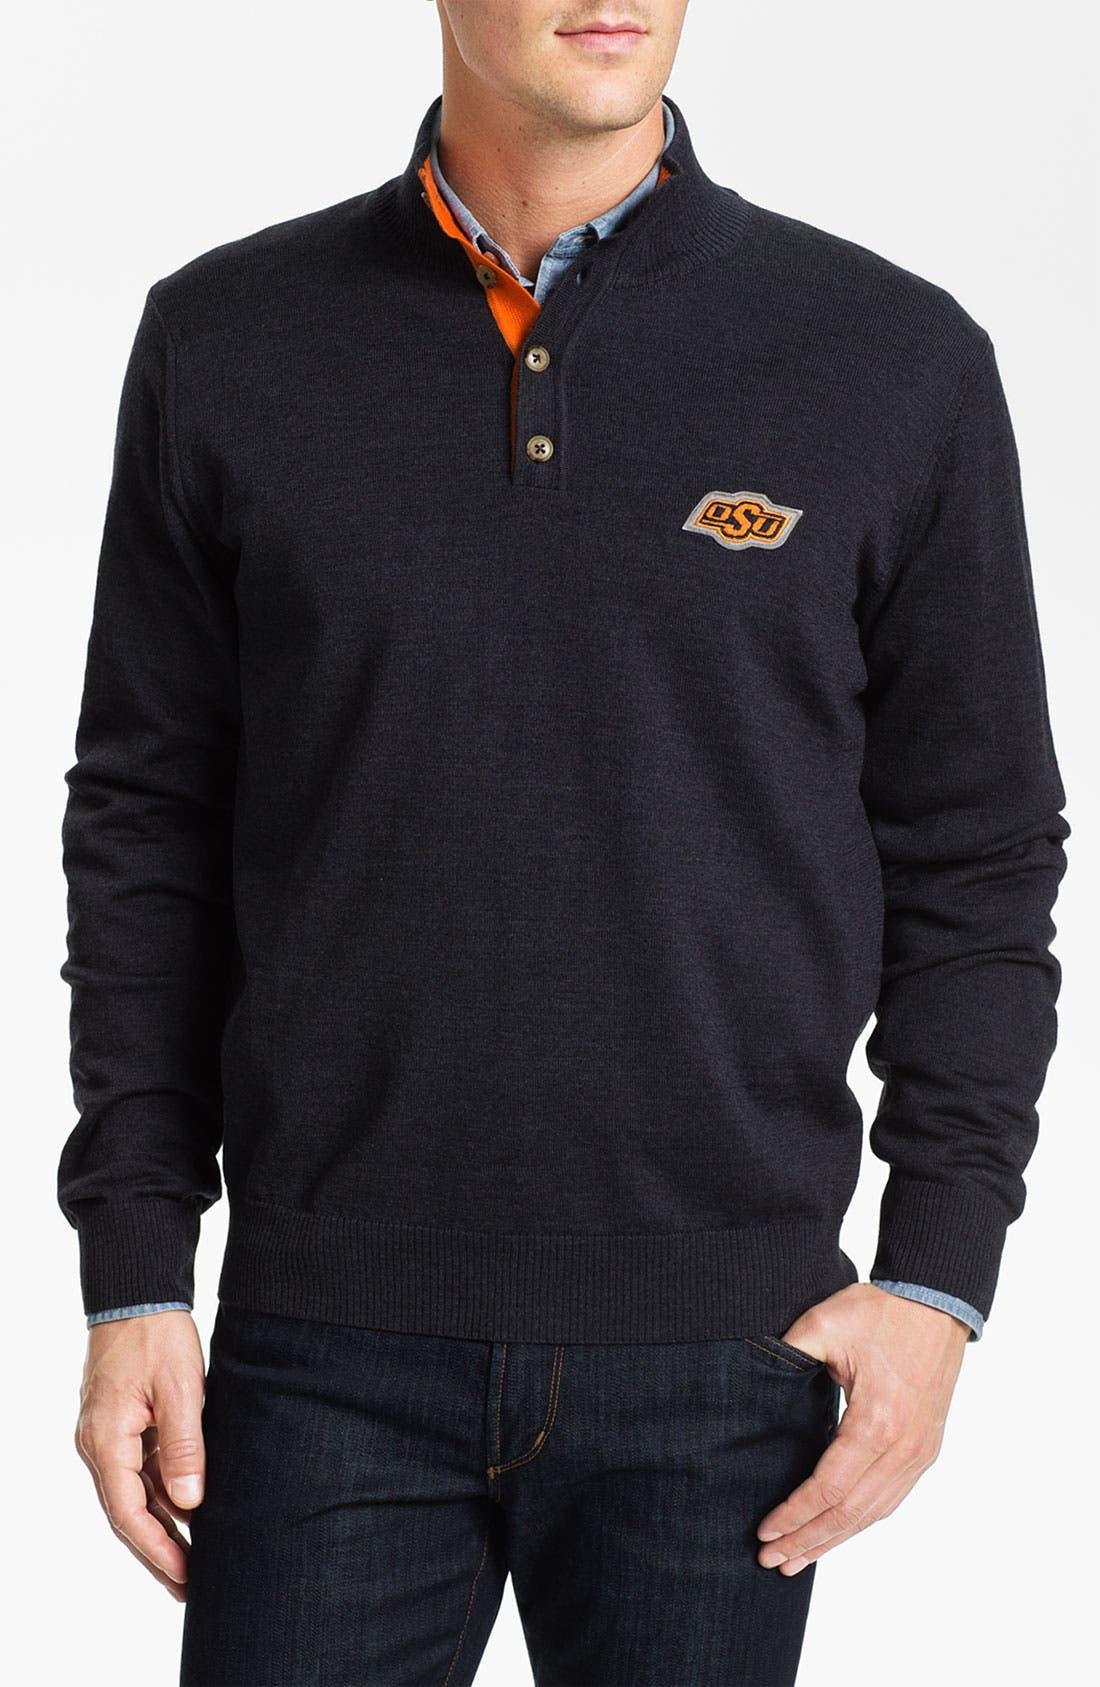 Alternate Image 1 Selected - Thomas Dean 'Oklahoma State' Wool Sweater